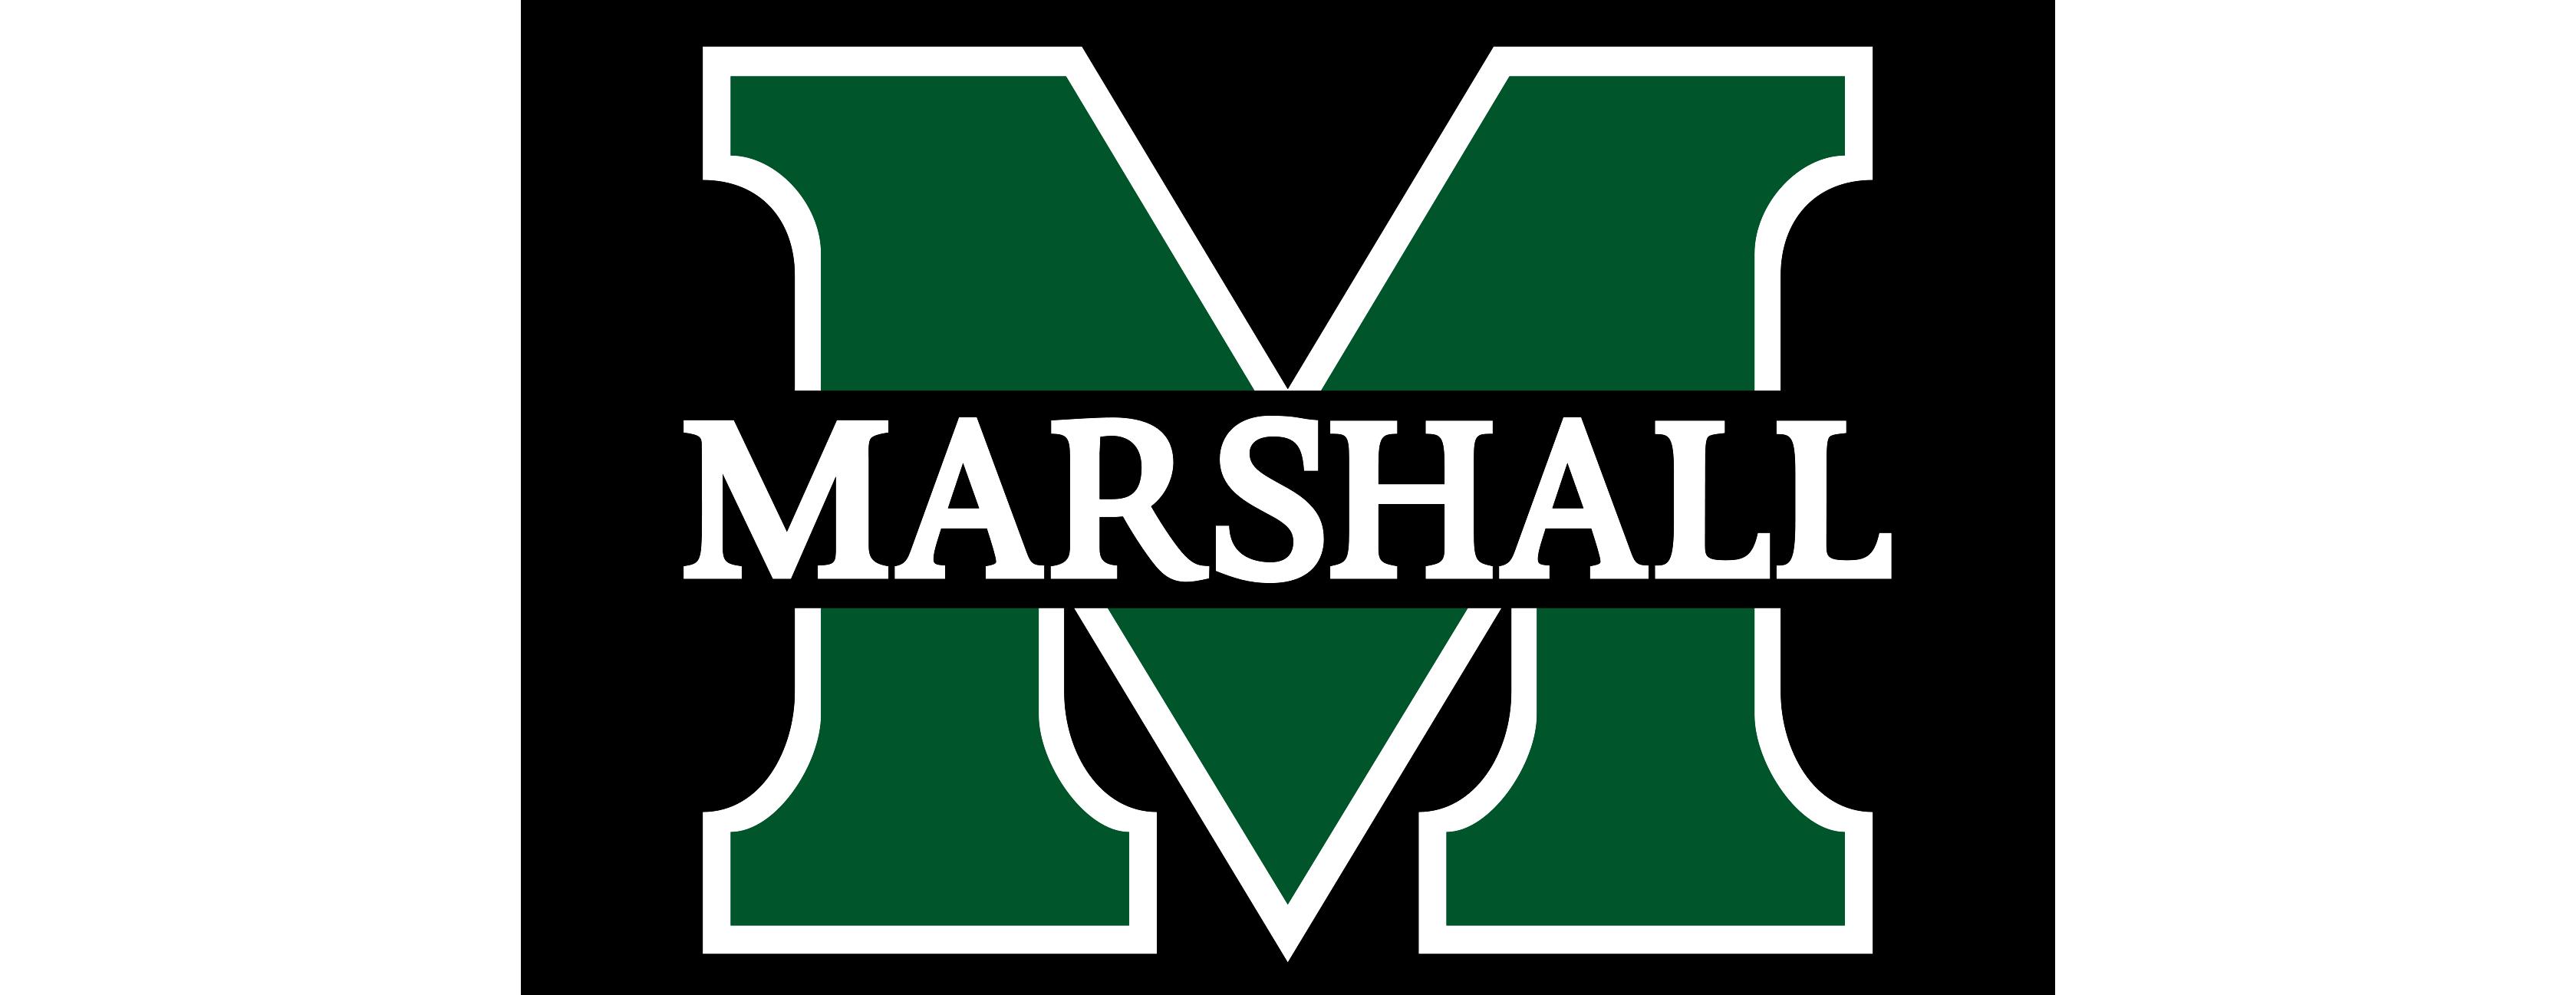 Study in the usa at marshall university for Marshalls cincinnati oh